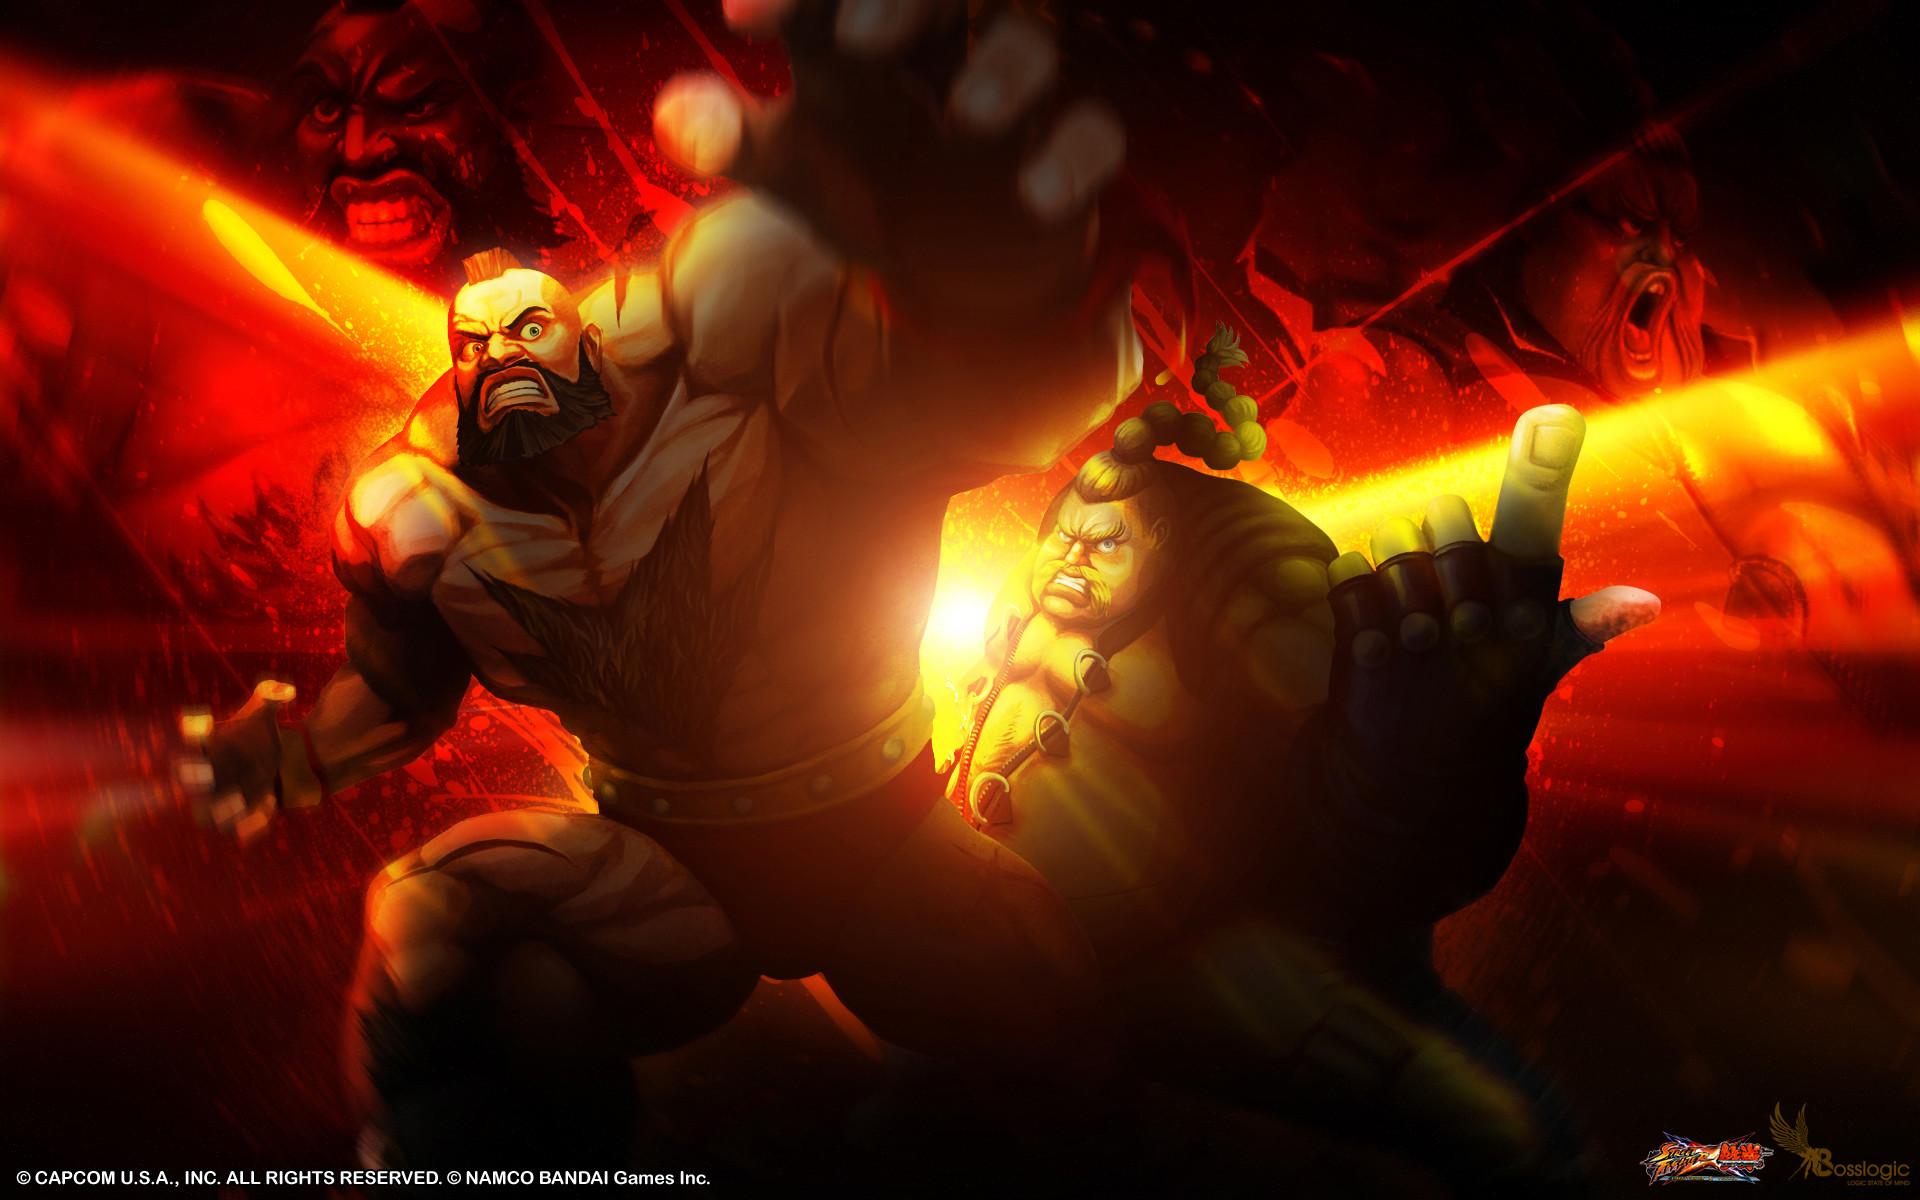 Street Fighter X Tekken Boss Logic wallpaper #9